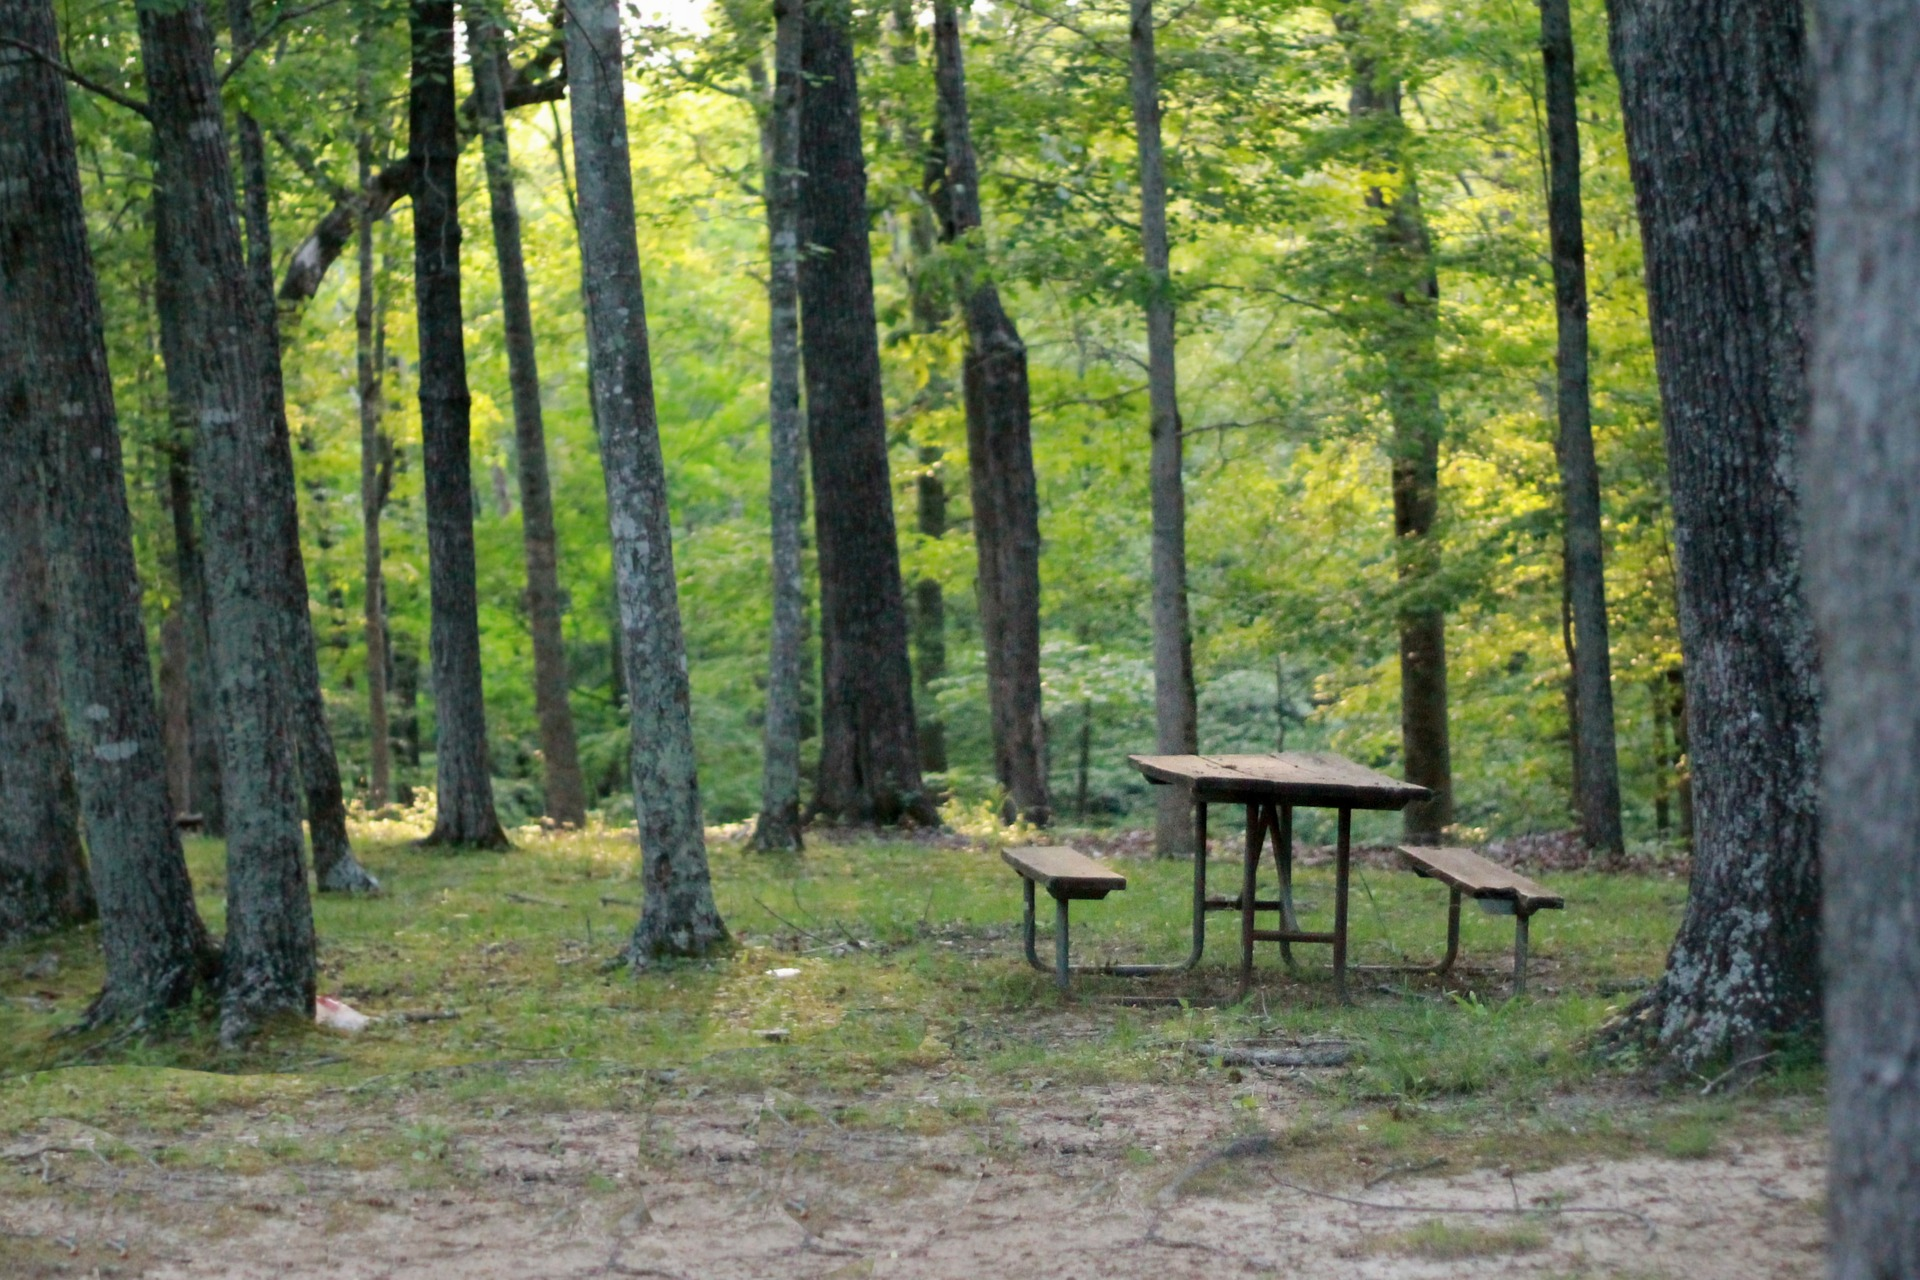 Nature photo | Outdoorsy RV Rental Marketplace